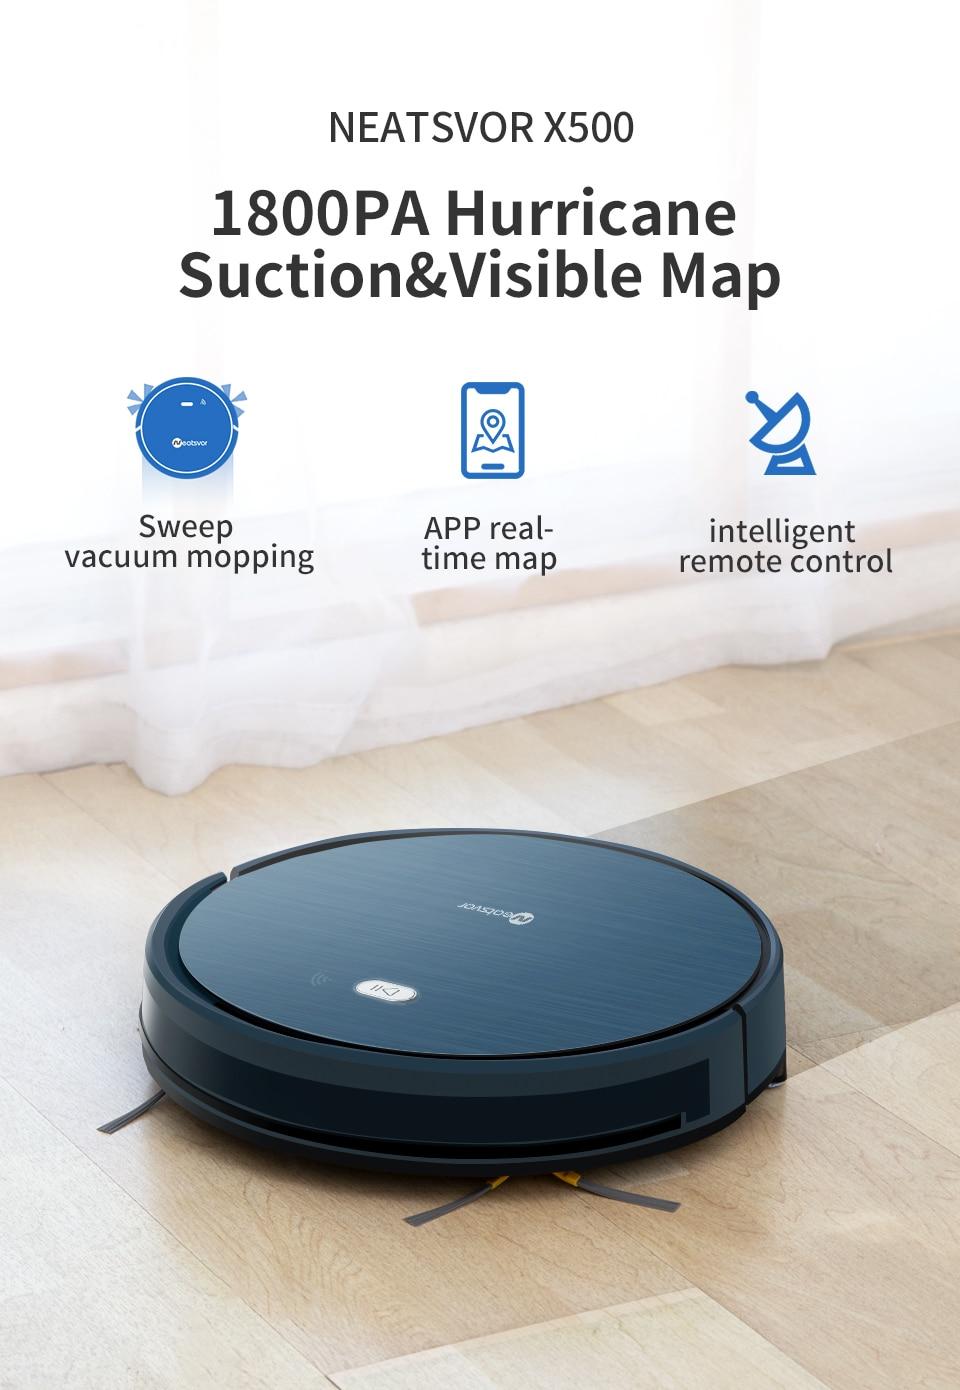 HTB1CmwuXET1gK0jSZFhq6yAtVXaw NEATSVOR X500 1800PA Robot Vacuum Cleaner,3in1 Wet Dry Mop,WIFI Map Navigation,Smart Memory,Anti Collision,Robot Aspirador